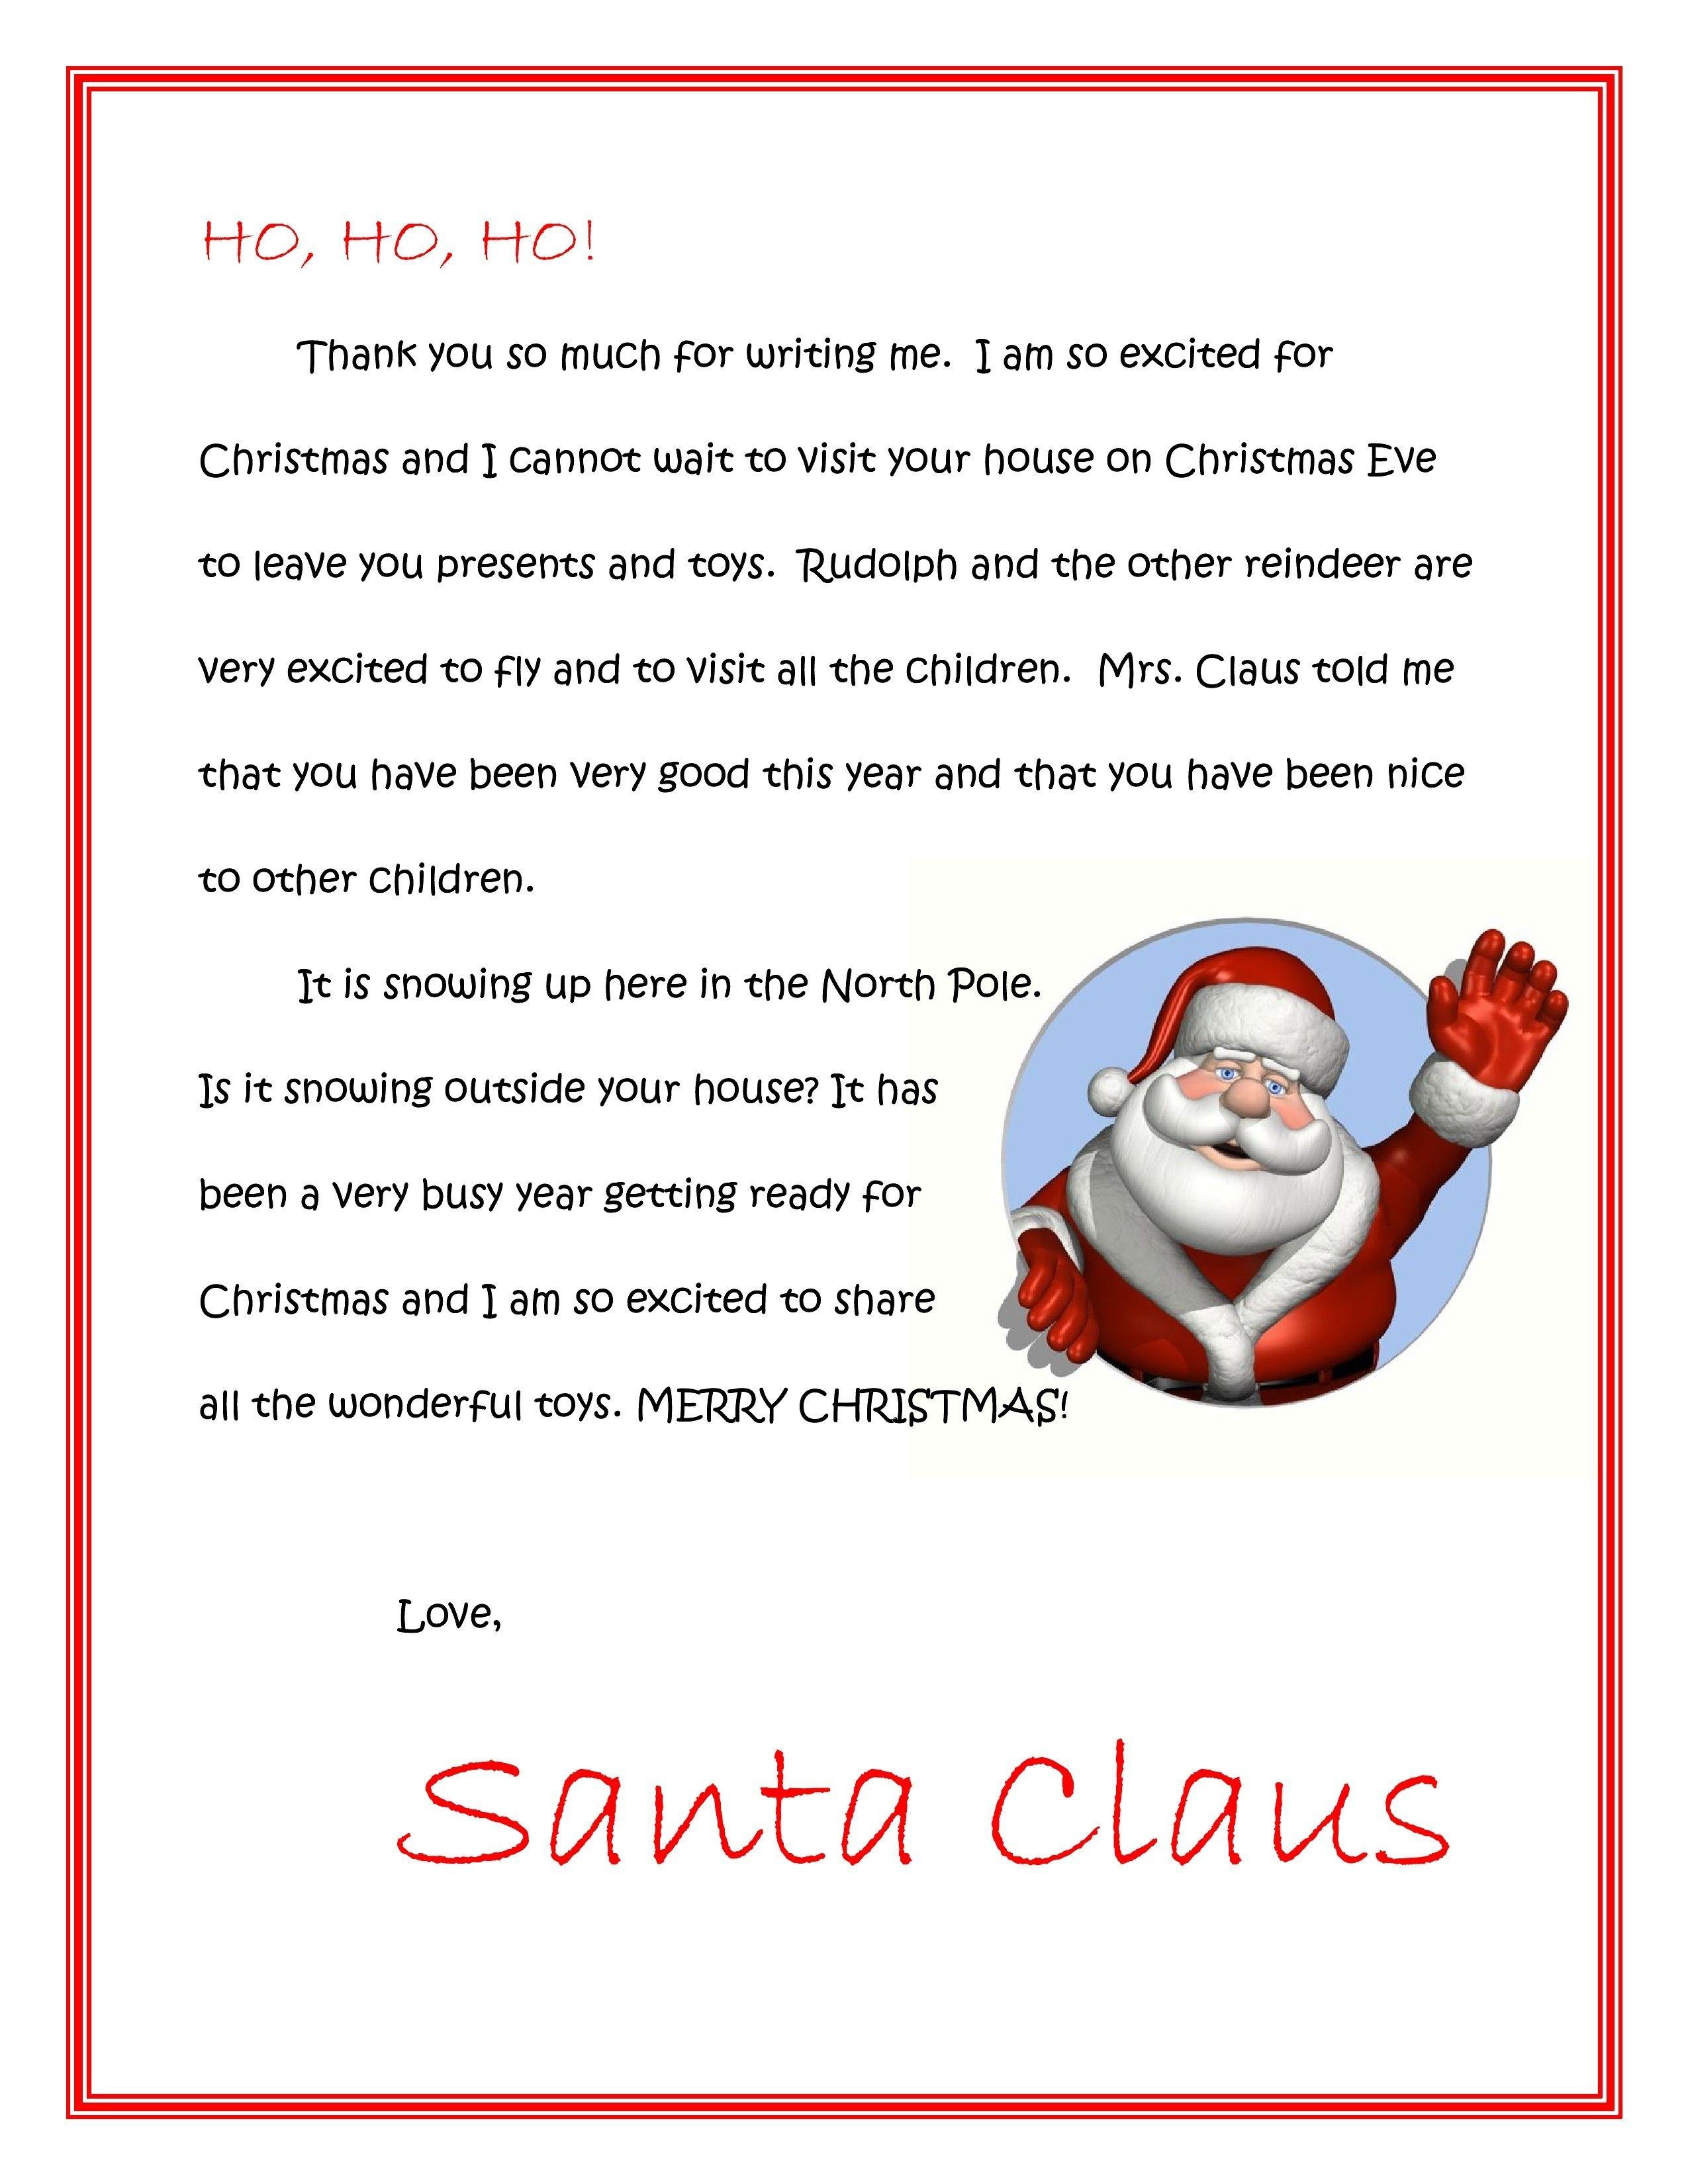 Free Dear Santa Letters Dear Santa Letters | Christmas Idea | Santa - Free Personalized Printable Letters From Santa Claus